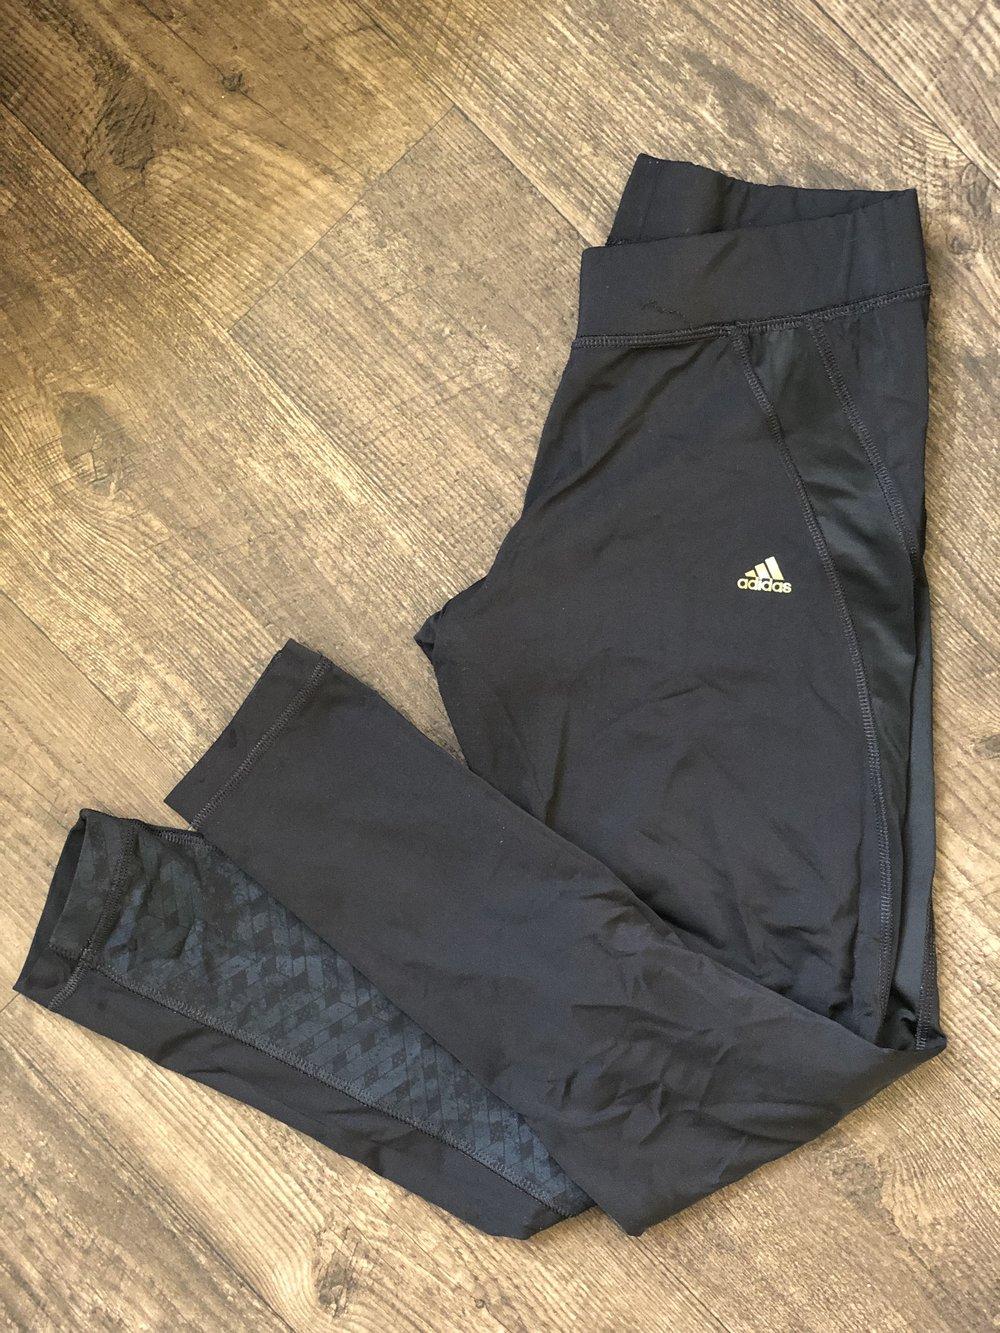 Adidas Running Tight mid rise // $30